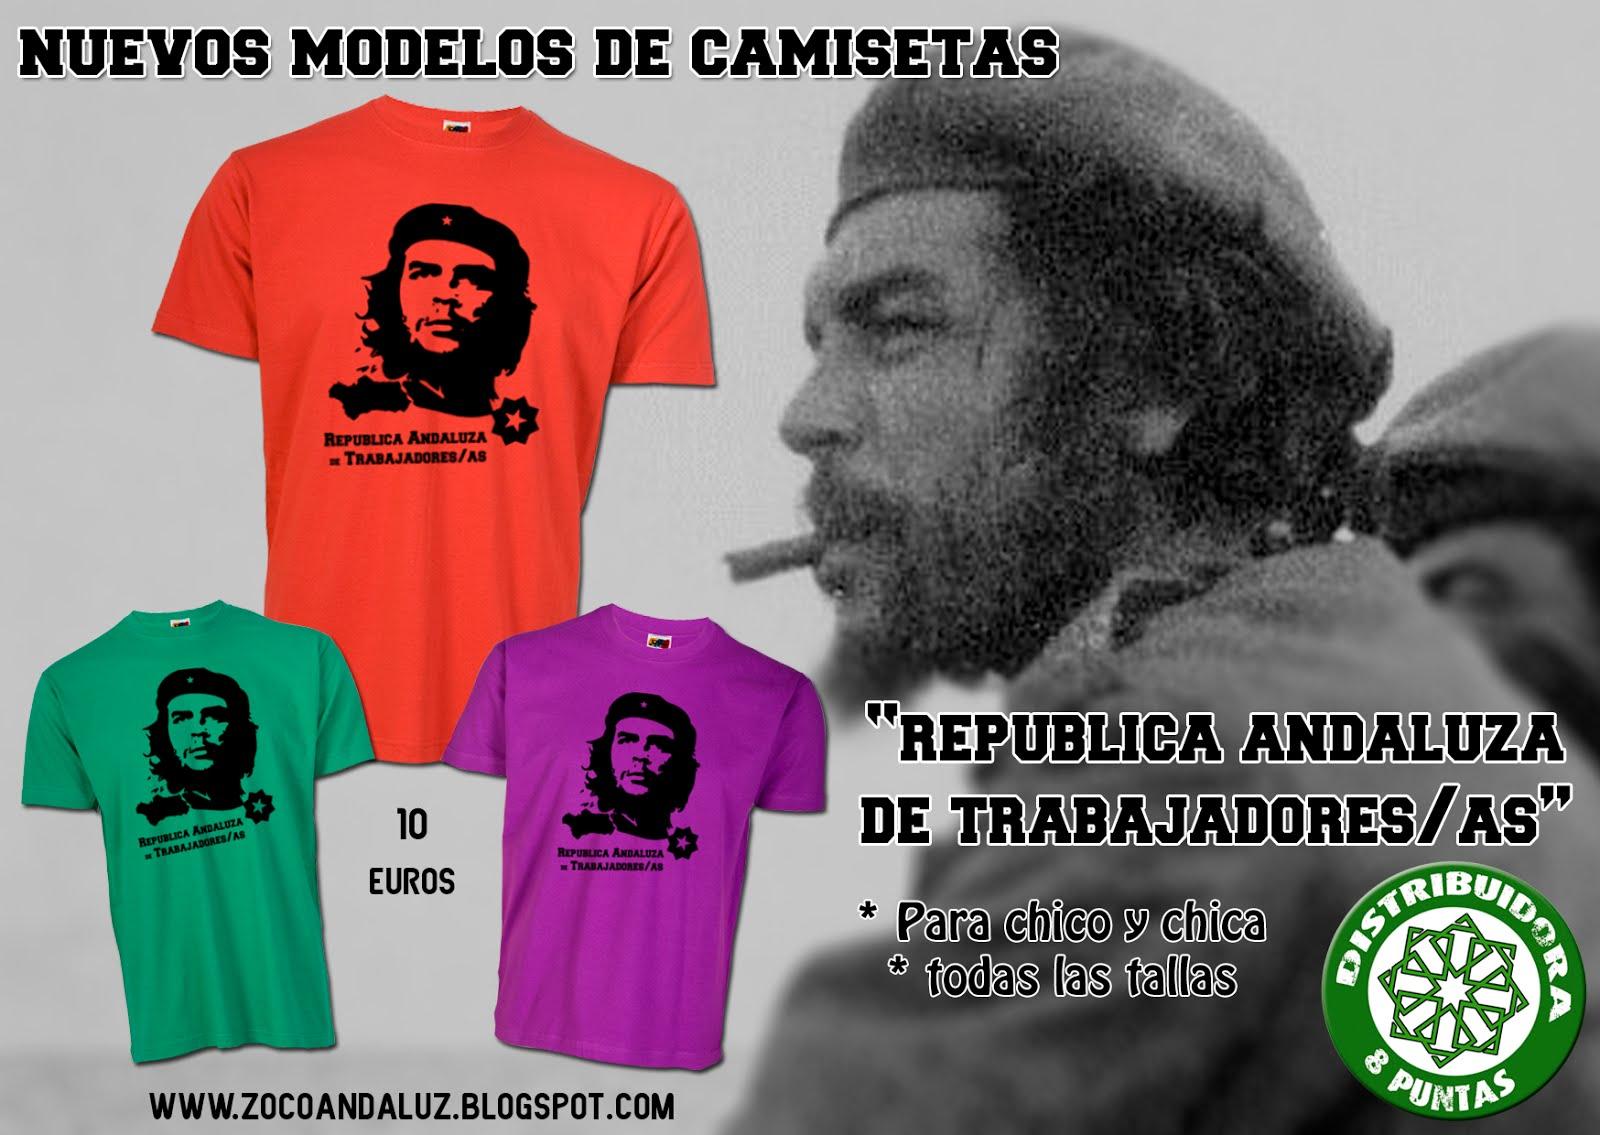 Camiseta República Andaluza Trabajadores/as, Che Guevara